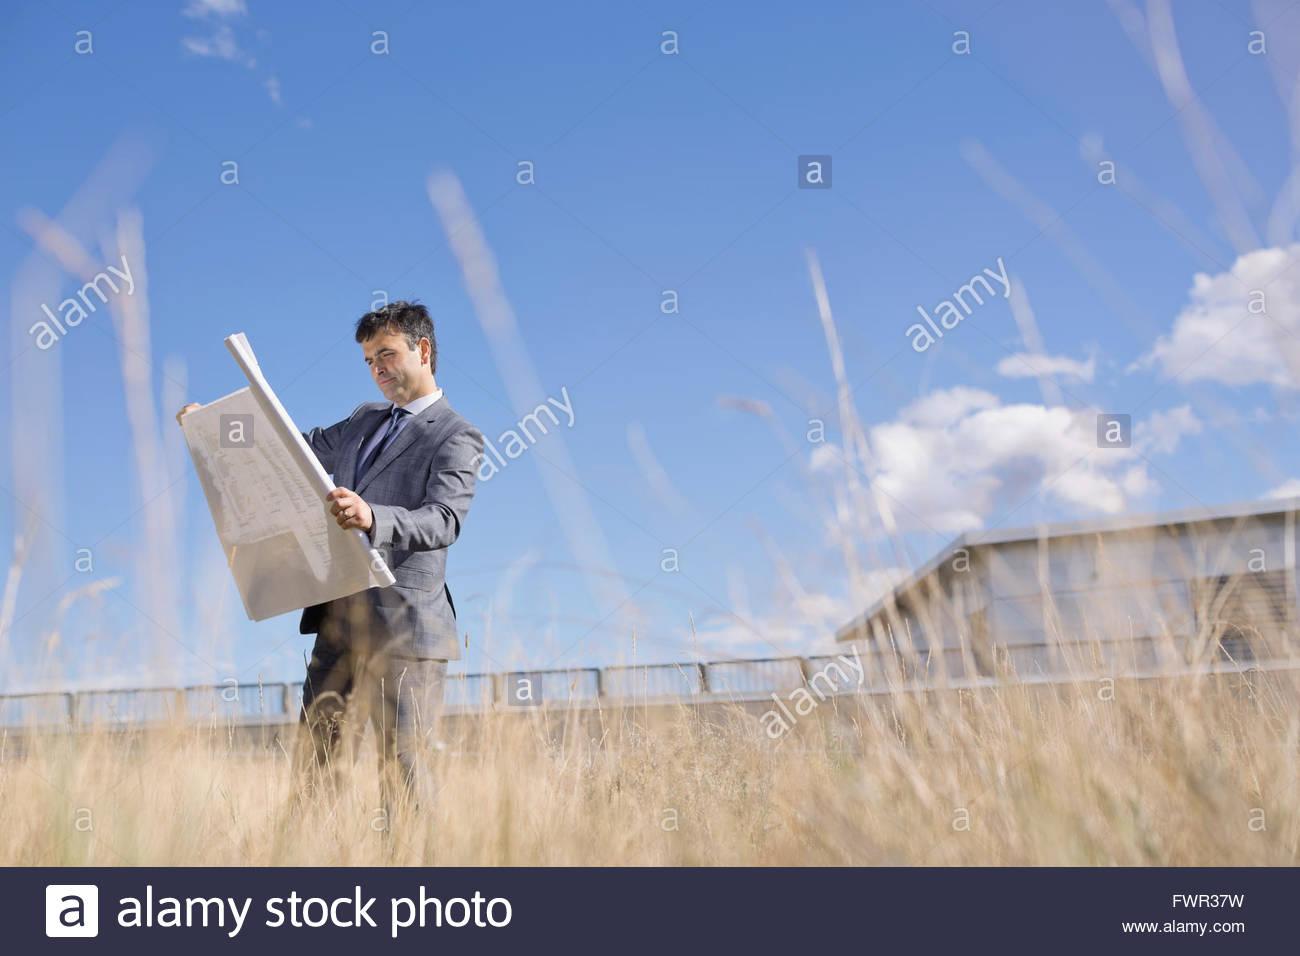 Businessman analyzing blueprint in field - Stock Image